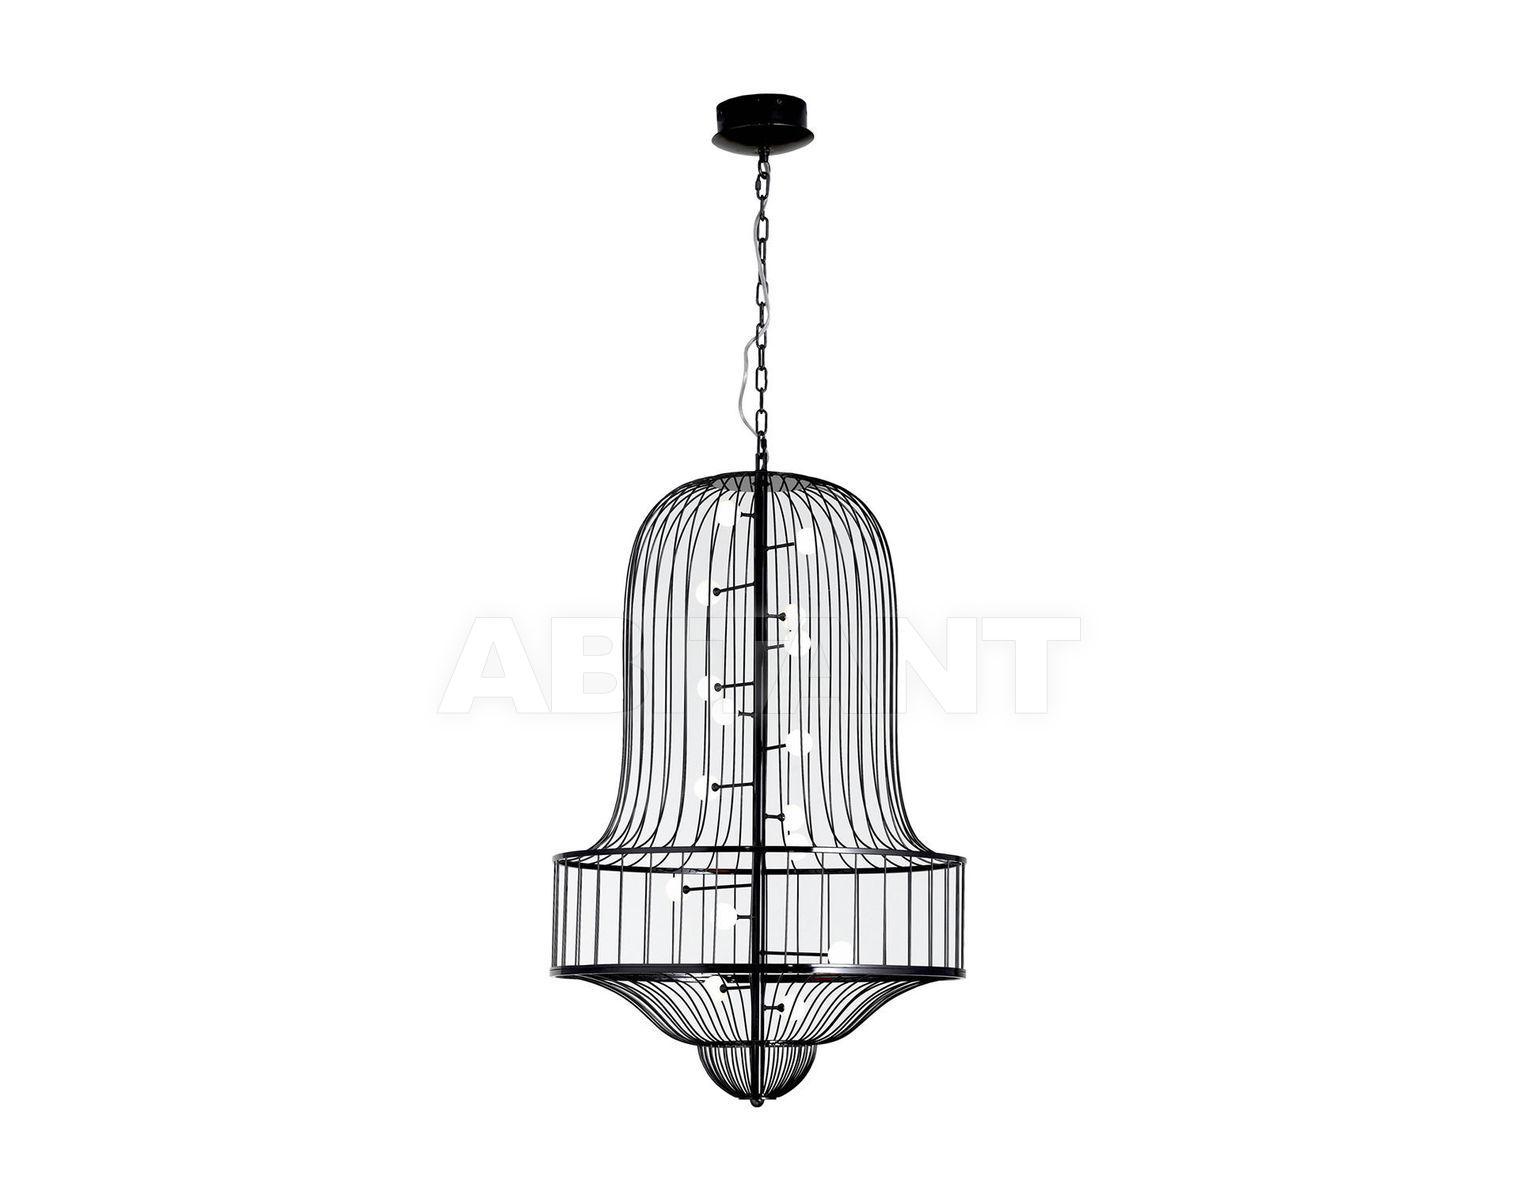 Купить Люстра LUCIOLA Driade L`arte Di Abitare 8918160